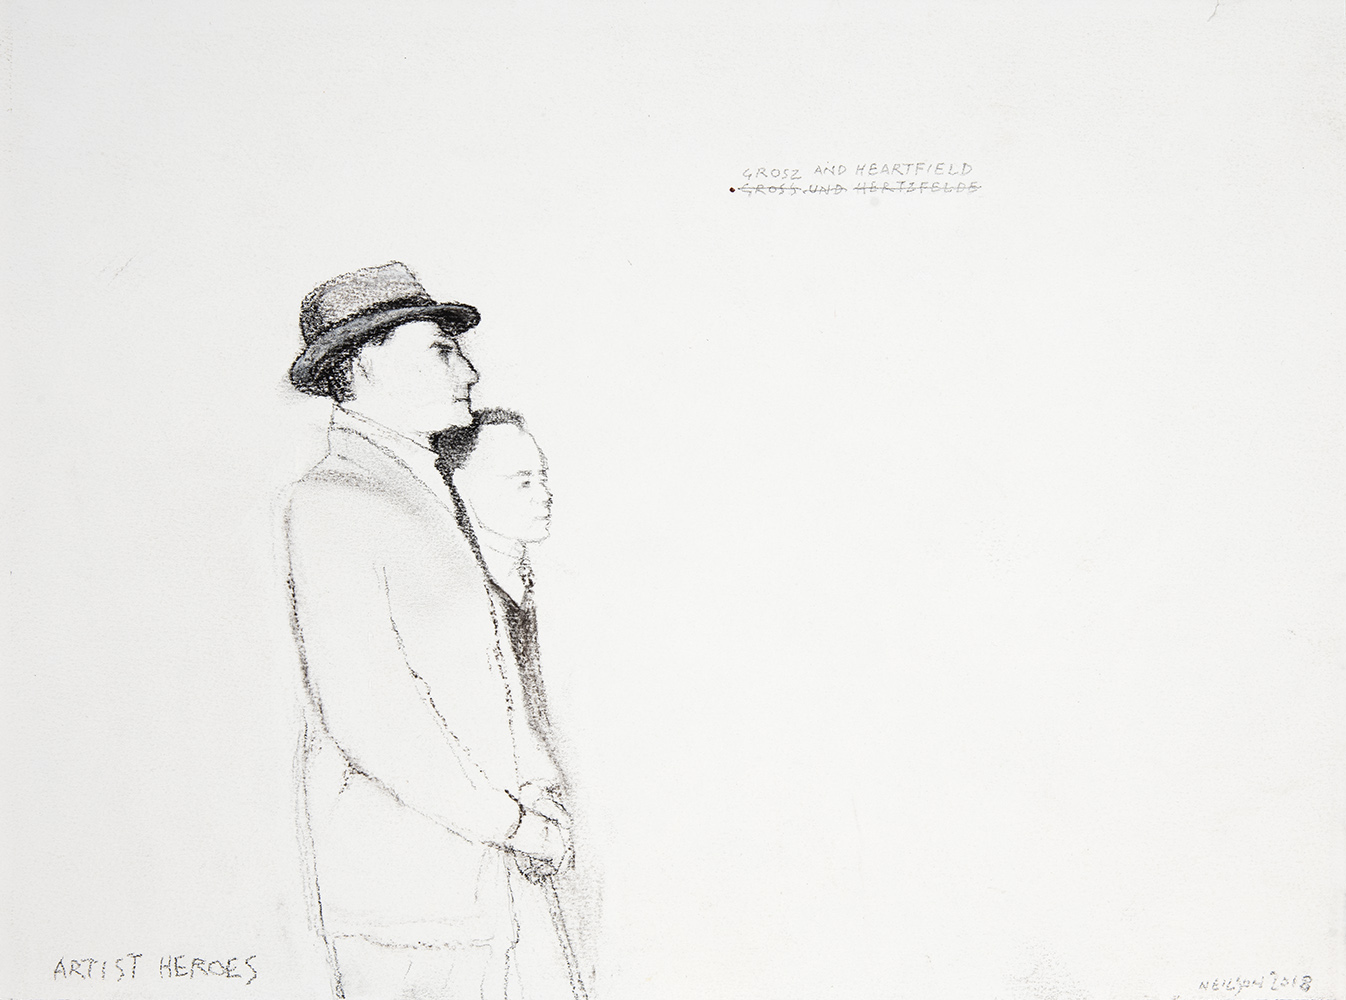 Artist heroes: Grosz and Heartfield